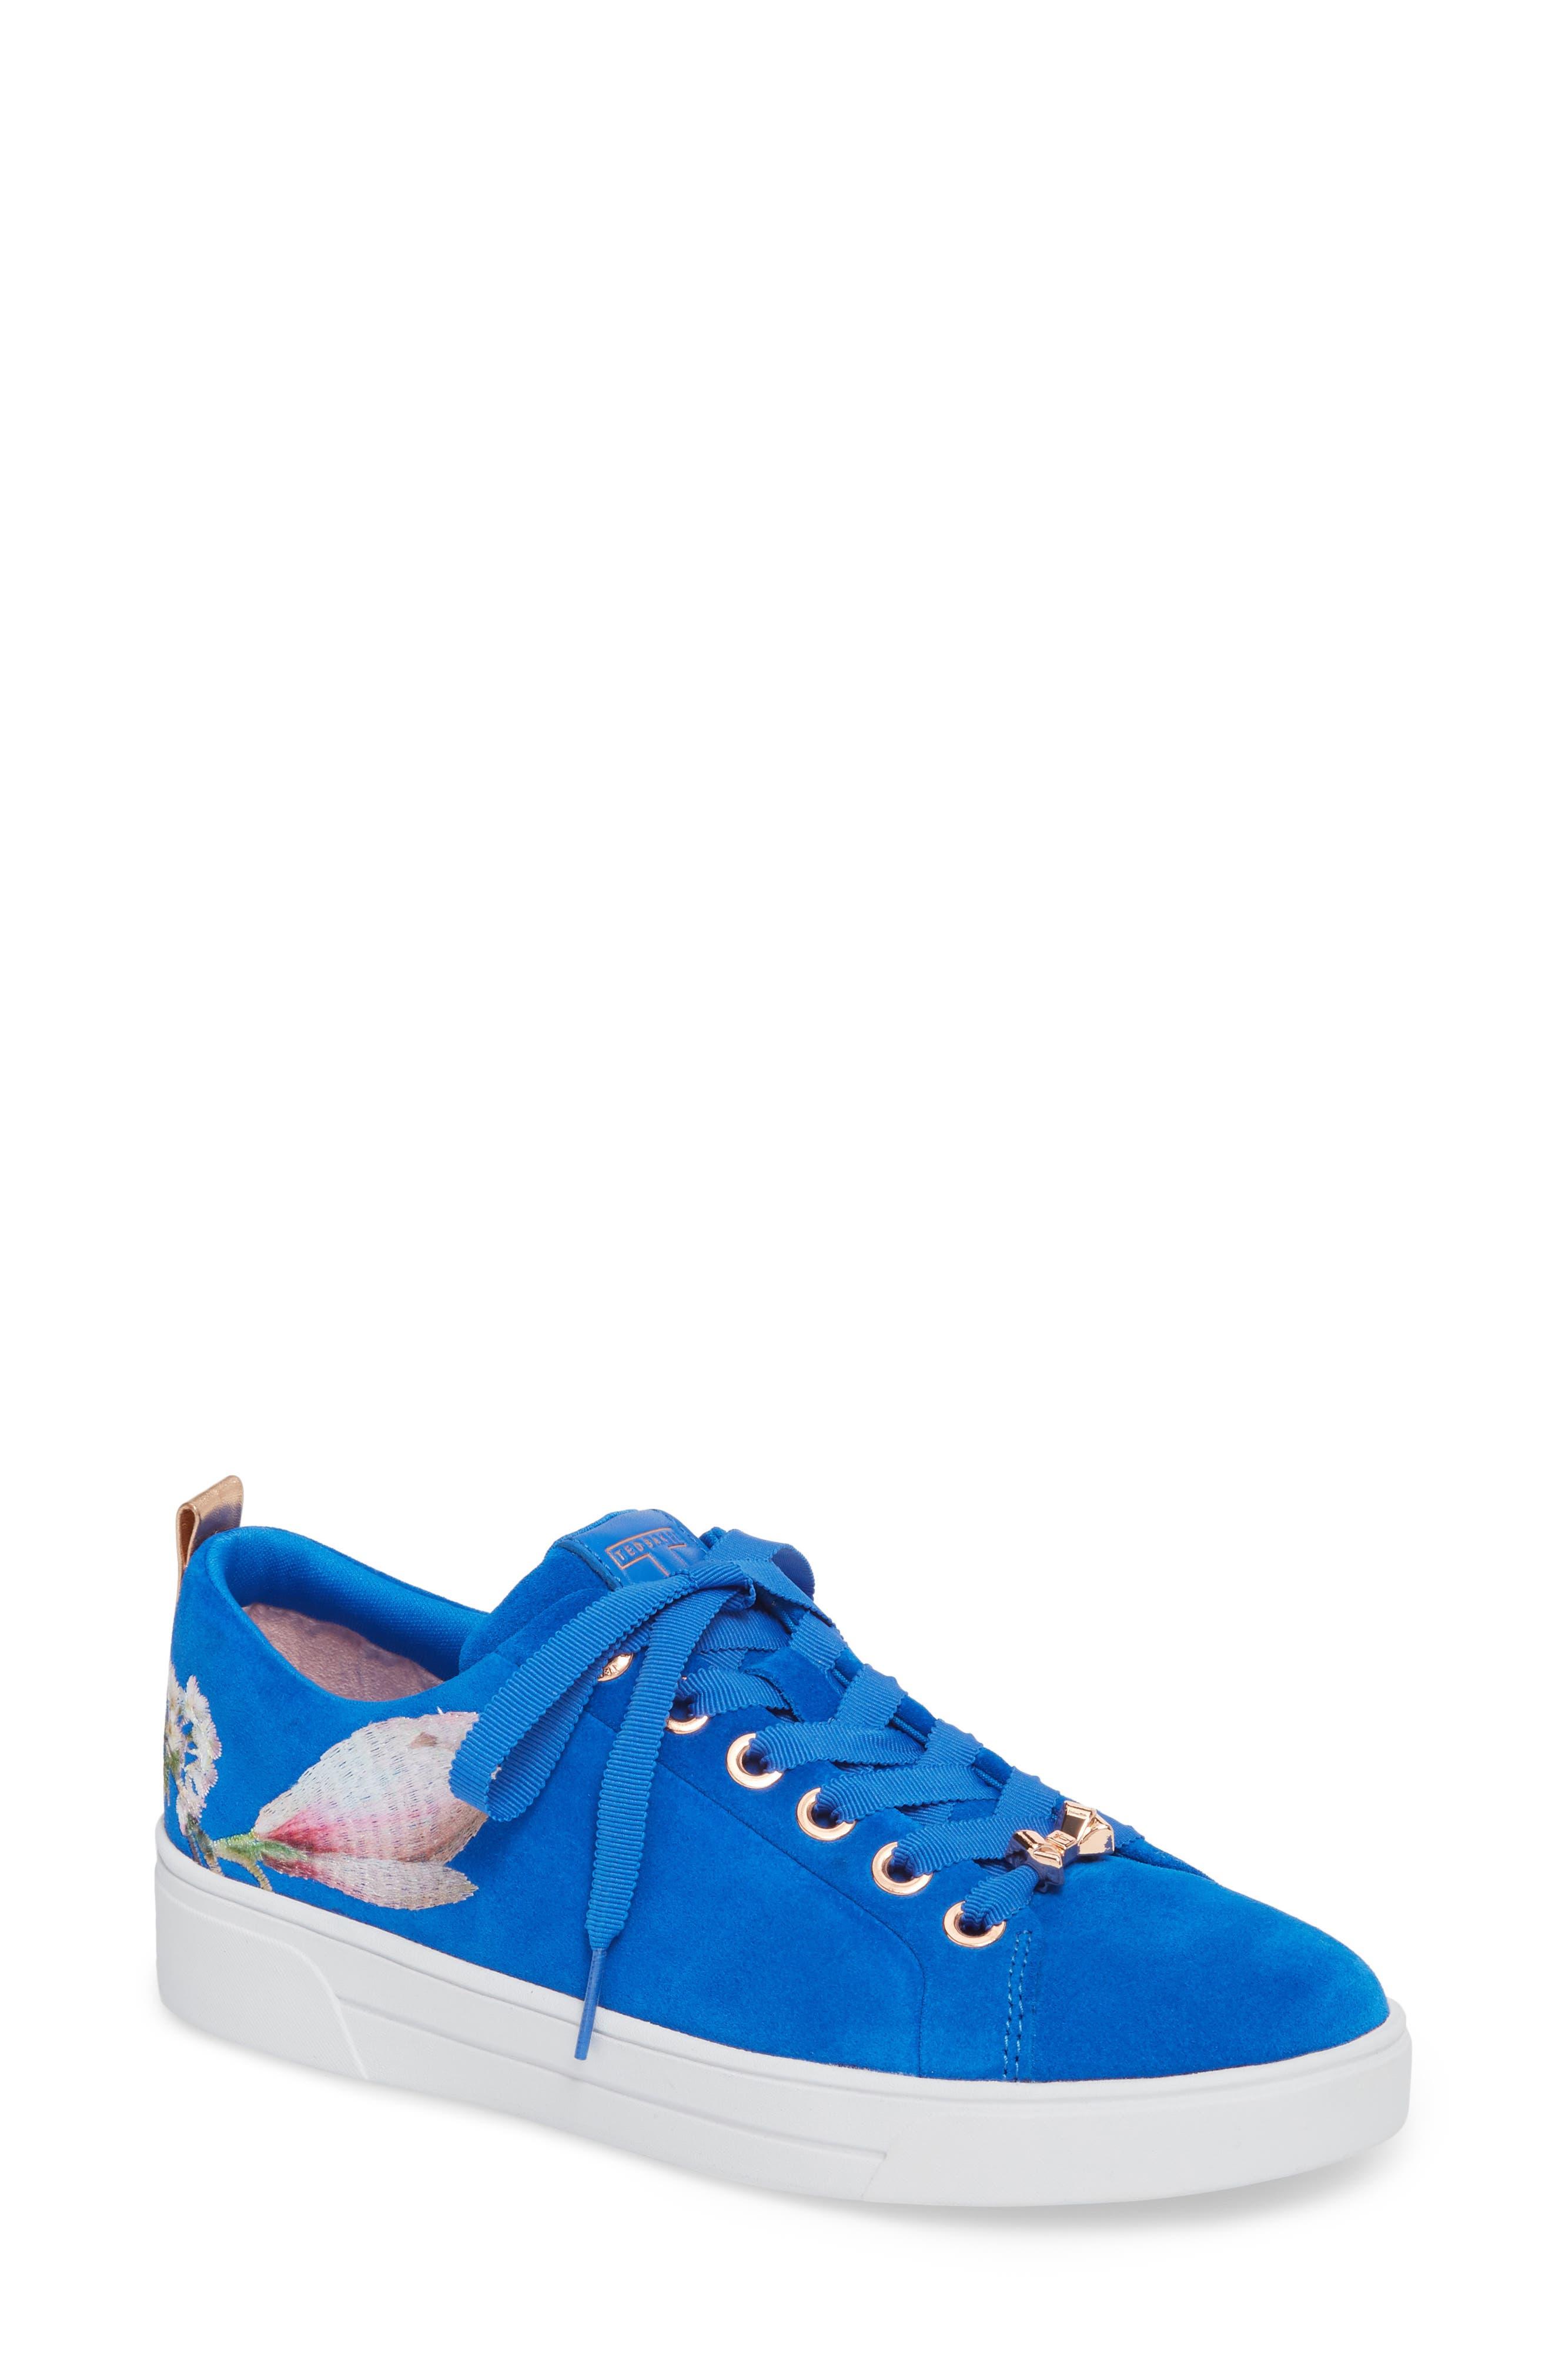 Eryin Sneaker,                         Main,                         color, BLUE HARMONY PRINT SUEDE